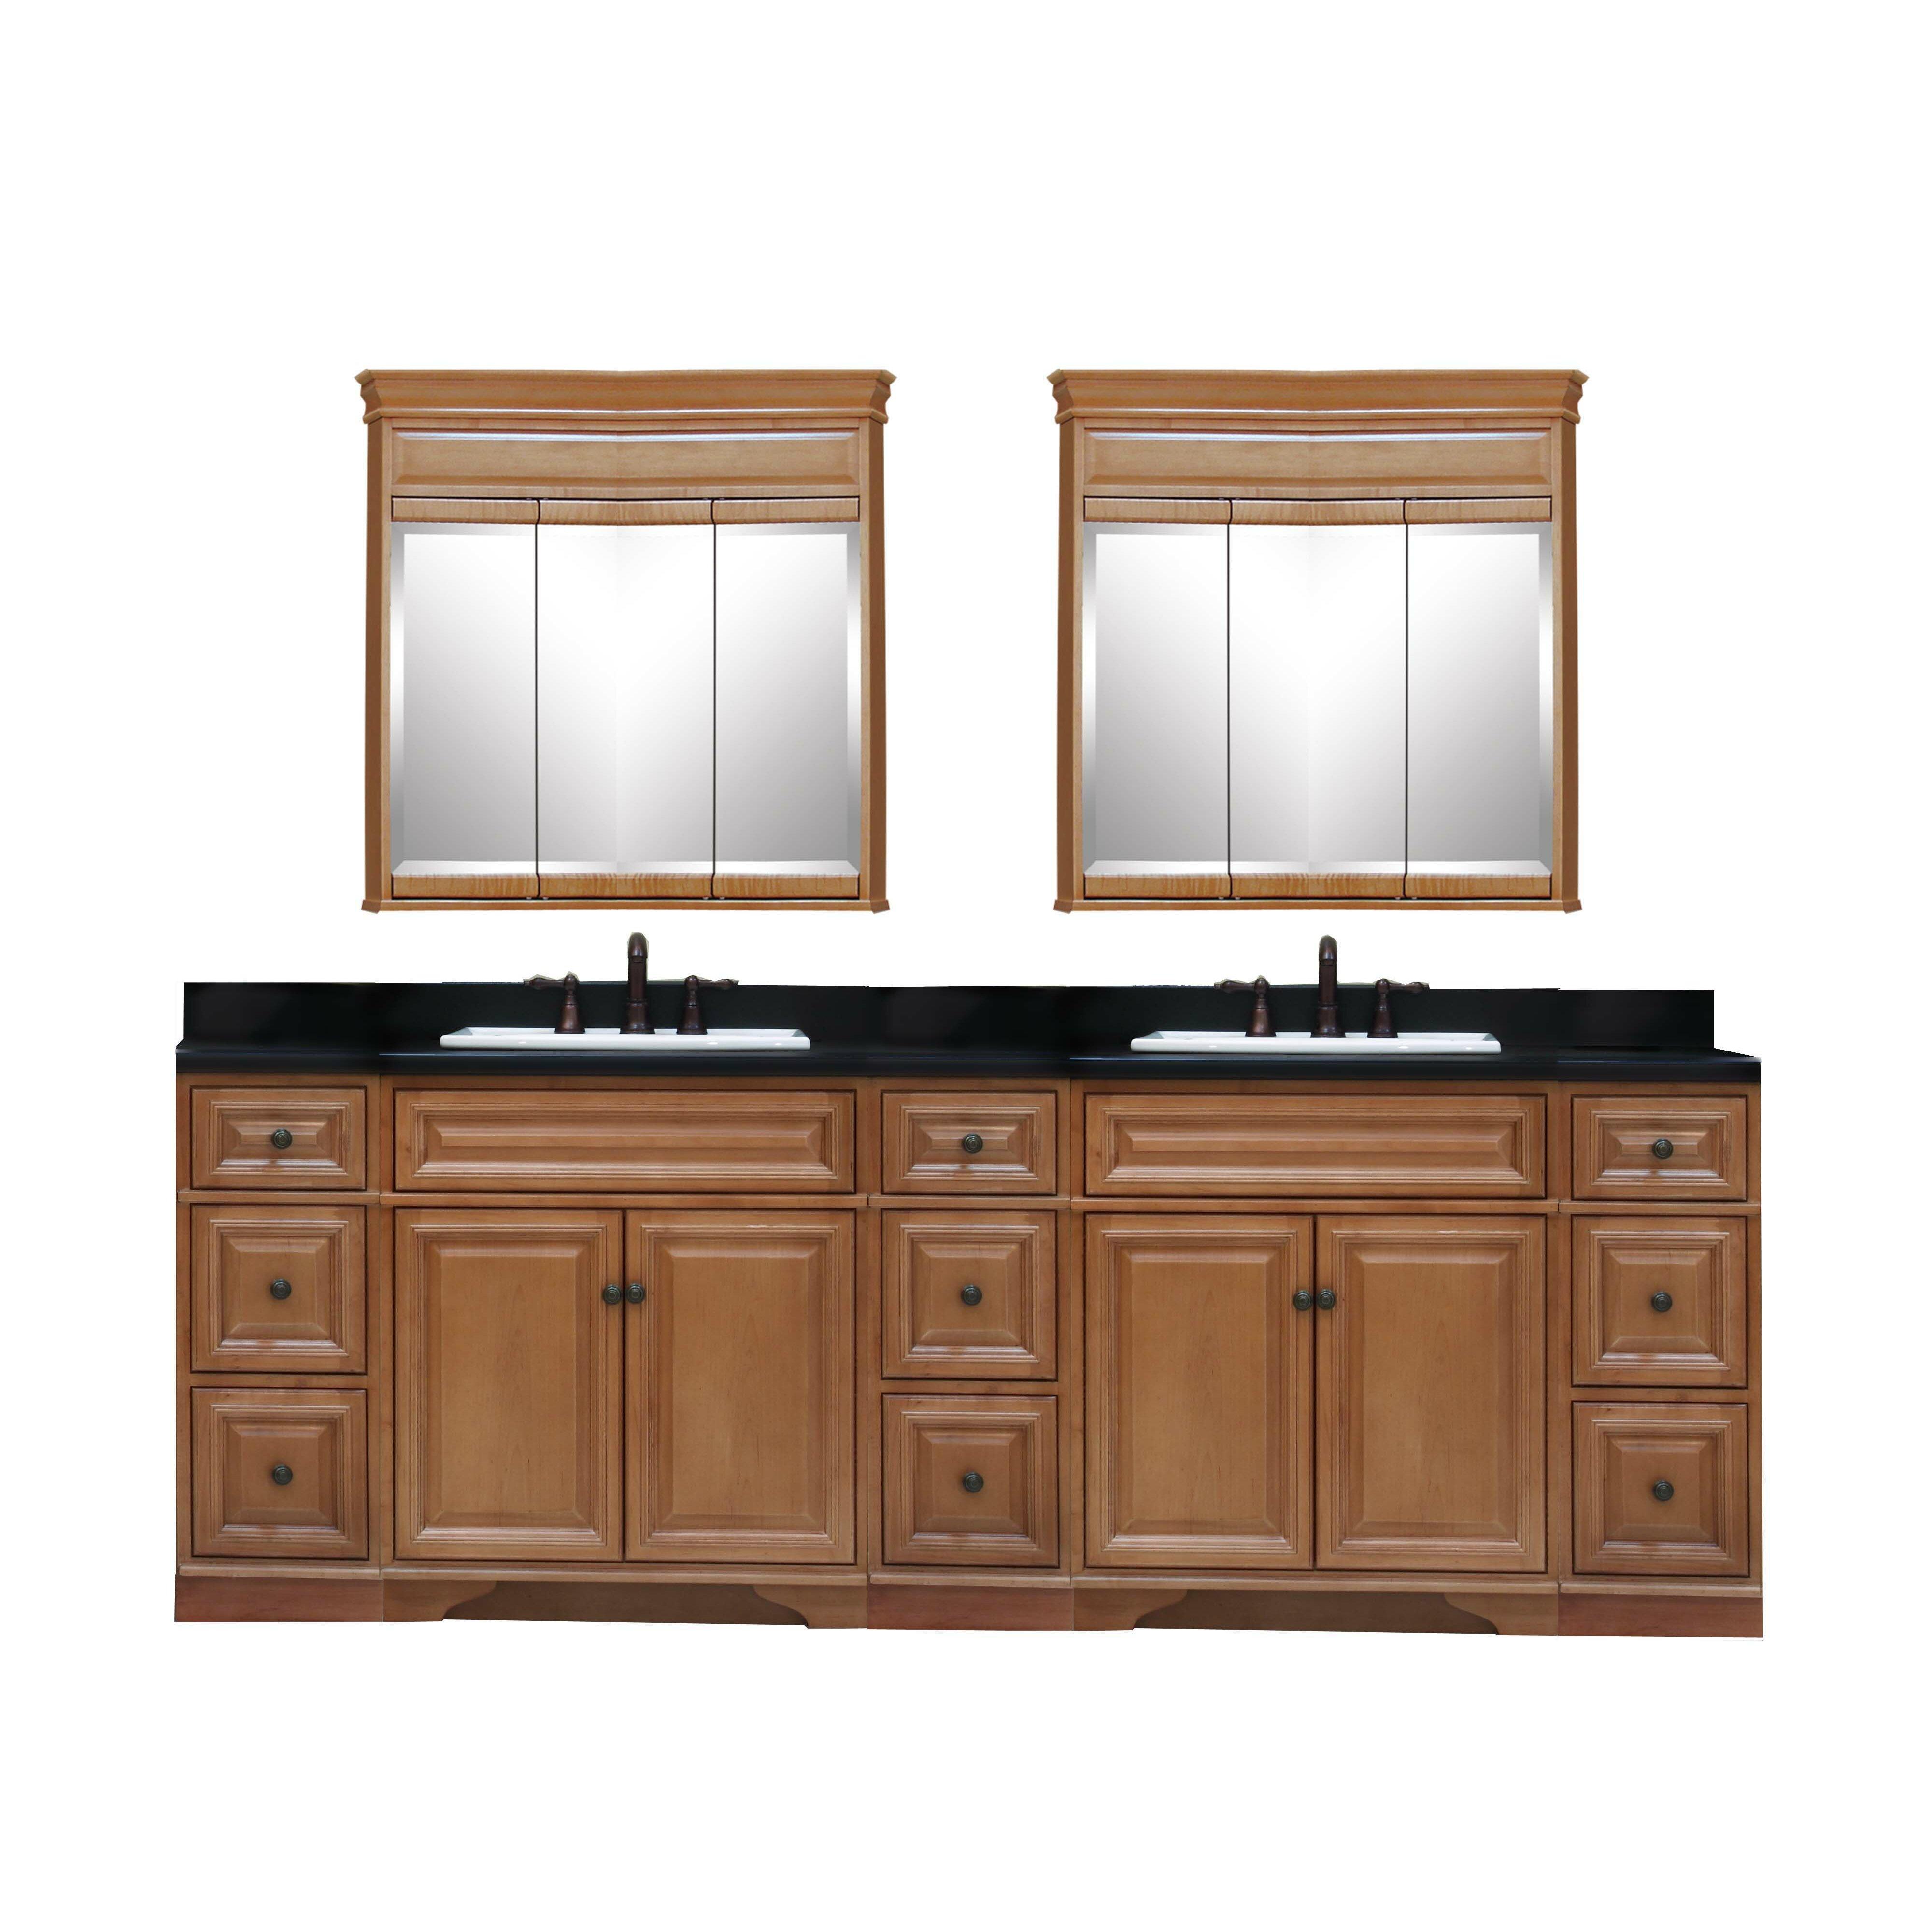 Sunnywood Kitchen Cabinets